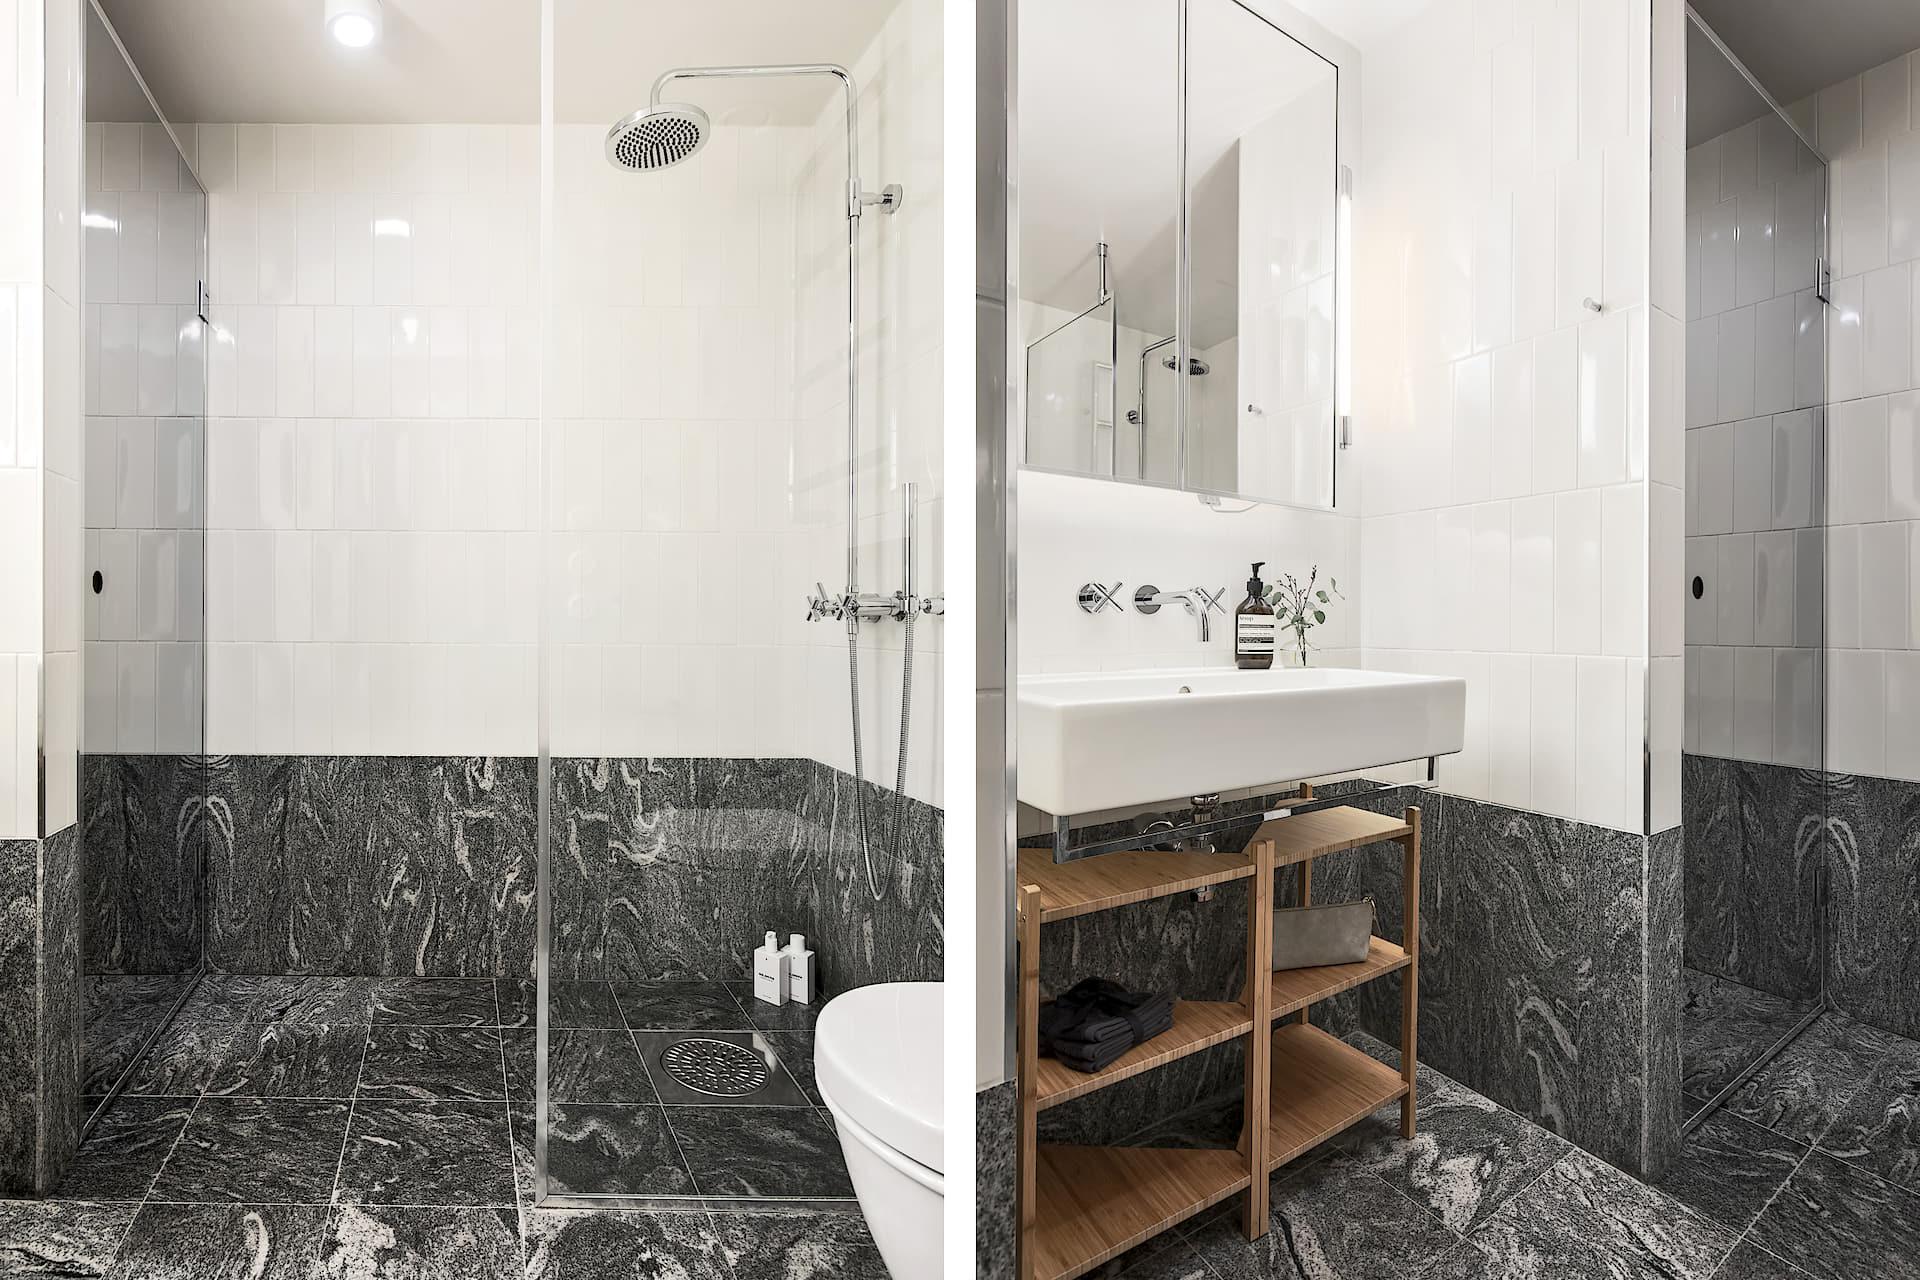 Klassieke luxe badkamer van een stoere loft woning - Badkamers ...